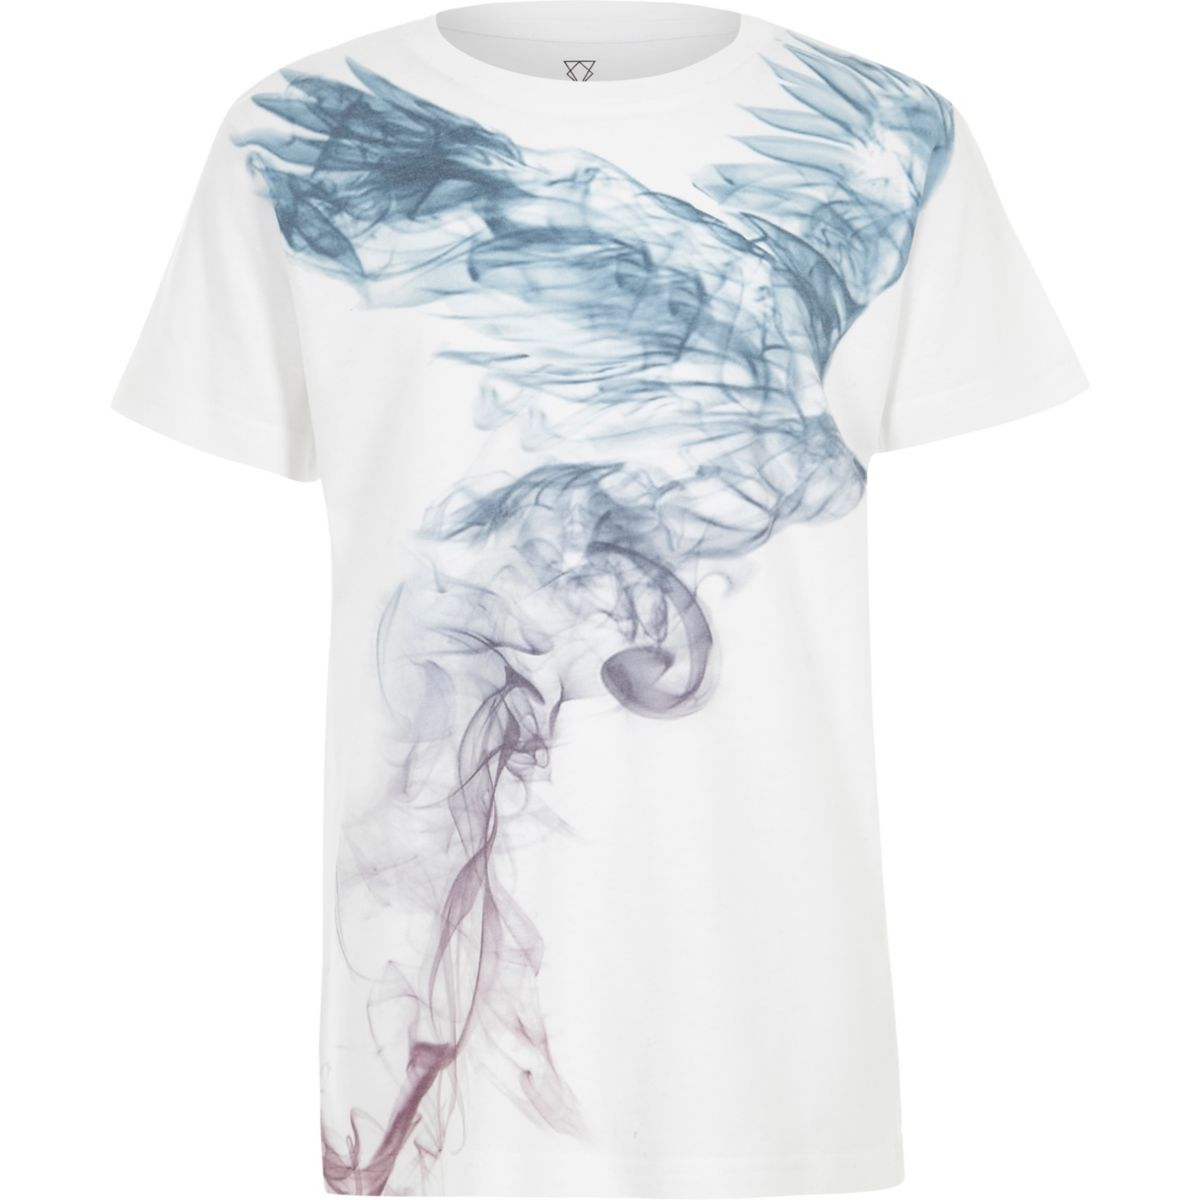 Boys white phoenix smudge print t shirt gifts sale boys for Phoenix t shirt printing